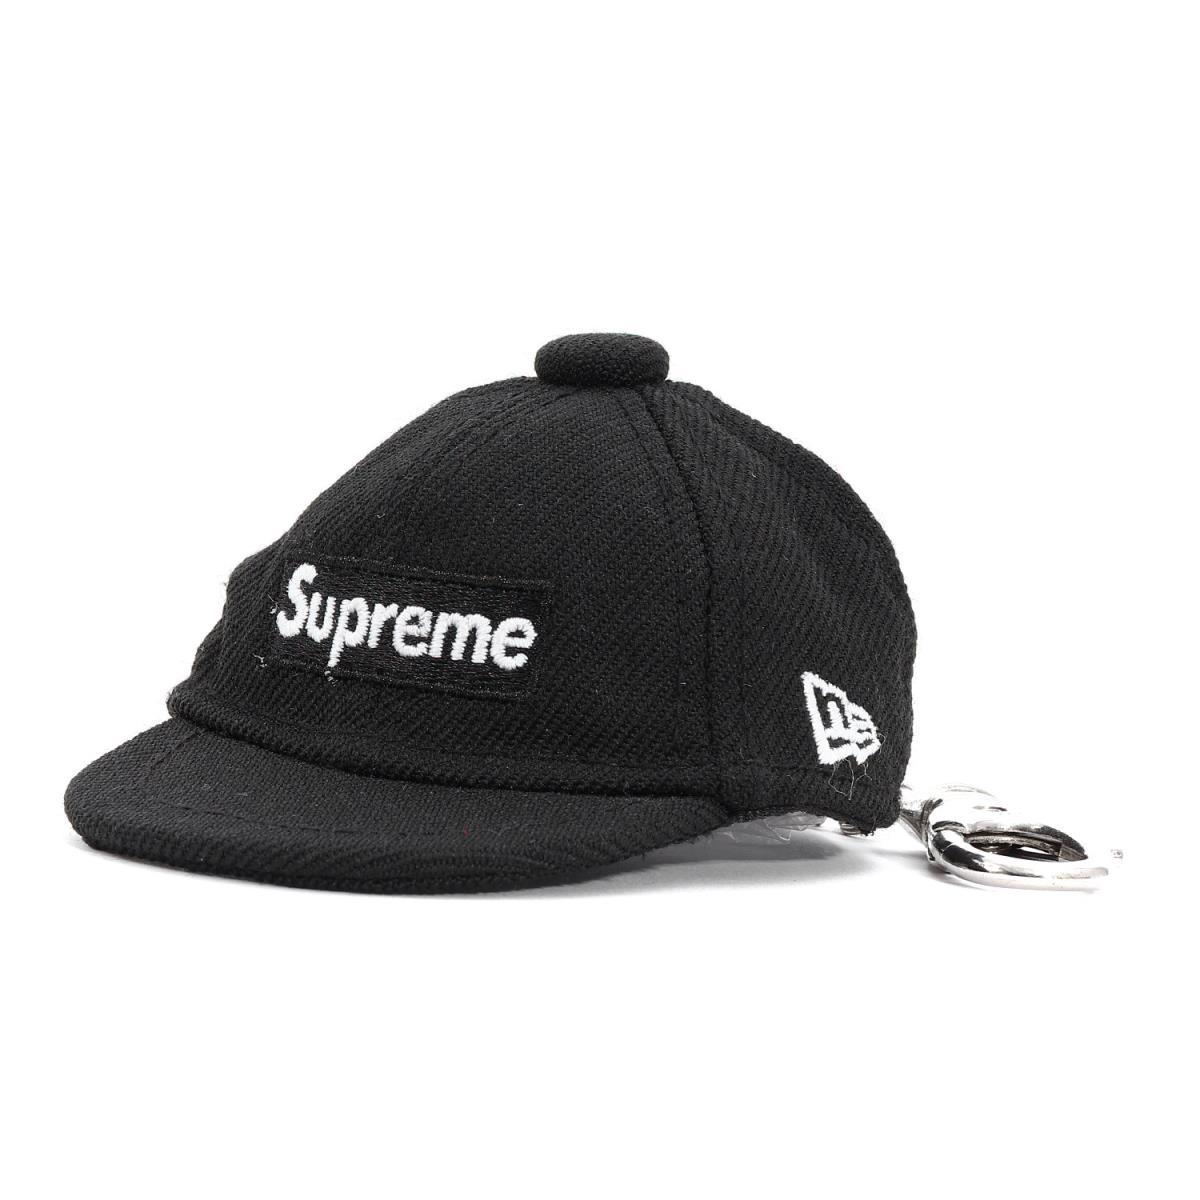 Supreme (シュプリーム) 14A/W ×NEW ERA BOXロゴベースボールキャップキーチェーン(Keychain) ブラック 【美品】【メンズ】【K2091】【中古】【あす楽☆対応可】